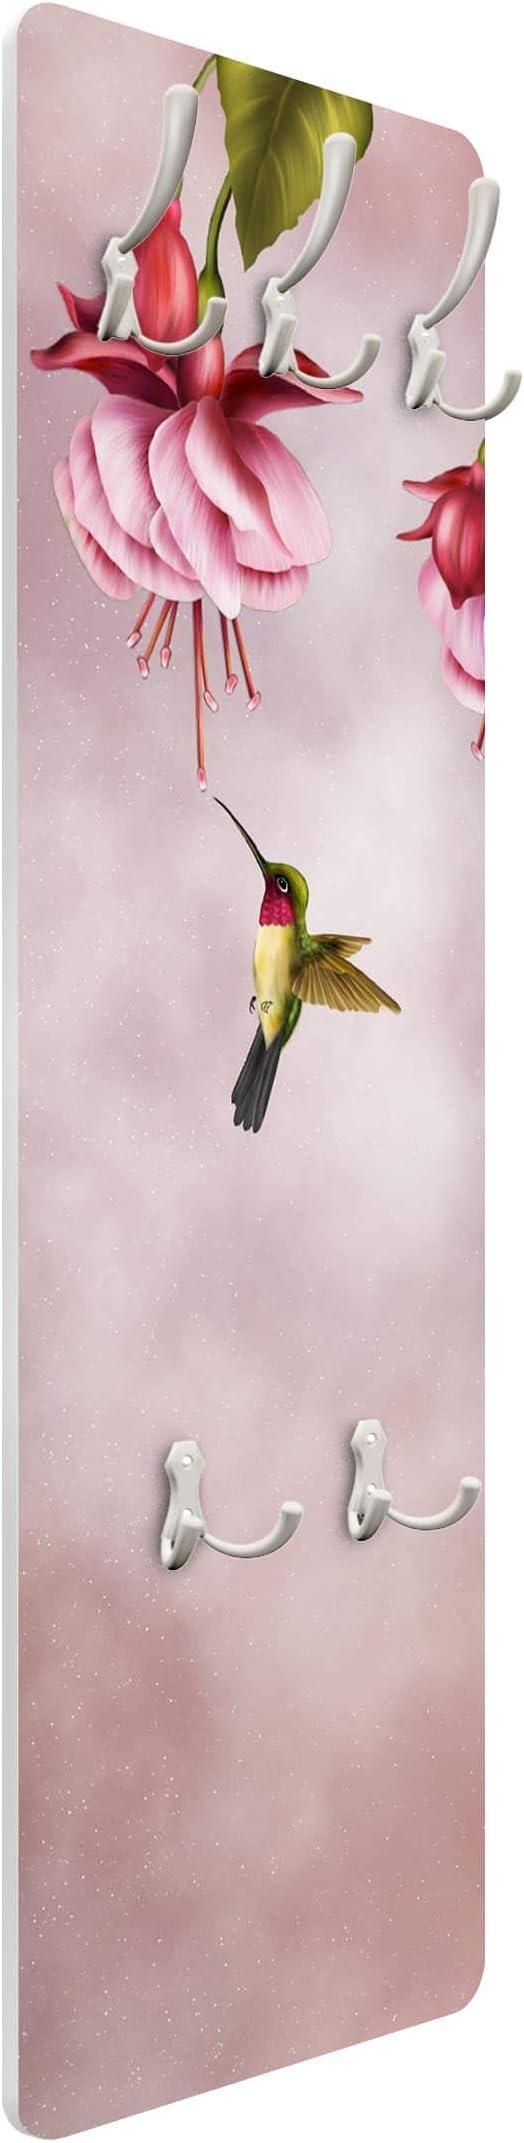 Appendiabiti /Hummingbird 139/x 46/x 2/cm,/ Appendiabiti da Parete attaccapanni /Appendiabiti Apalis Appendiabiti/ Appendiabiti Appendiabiti da Parete